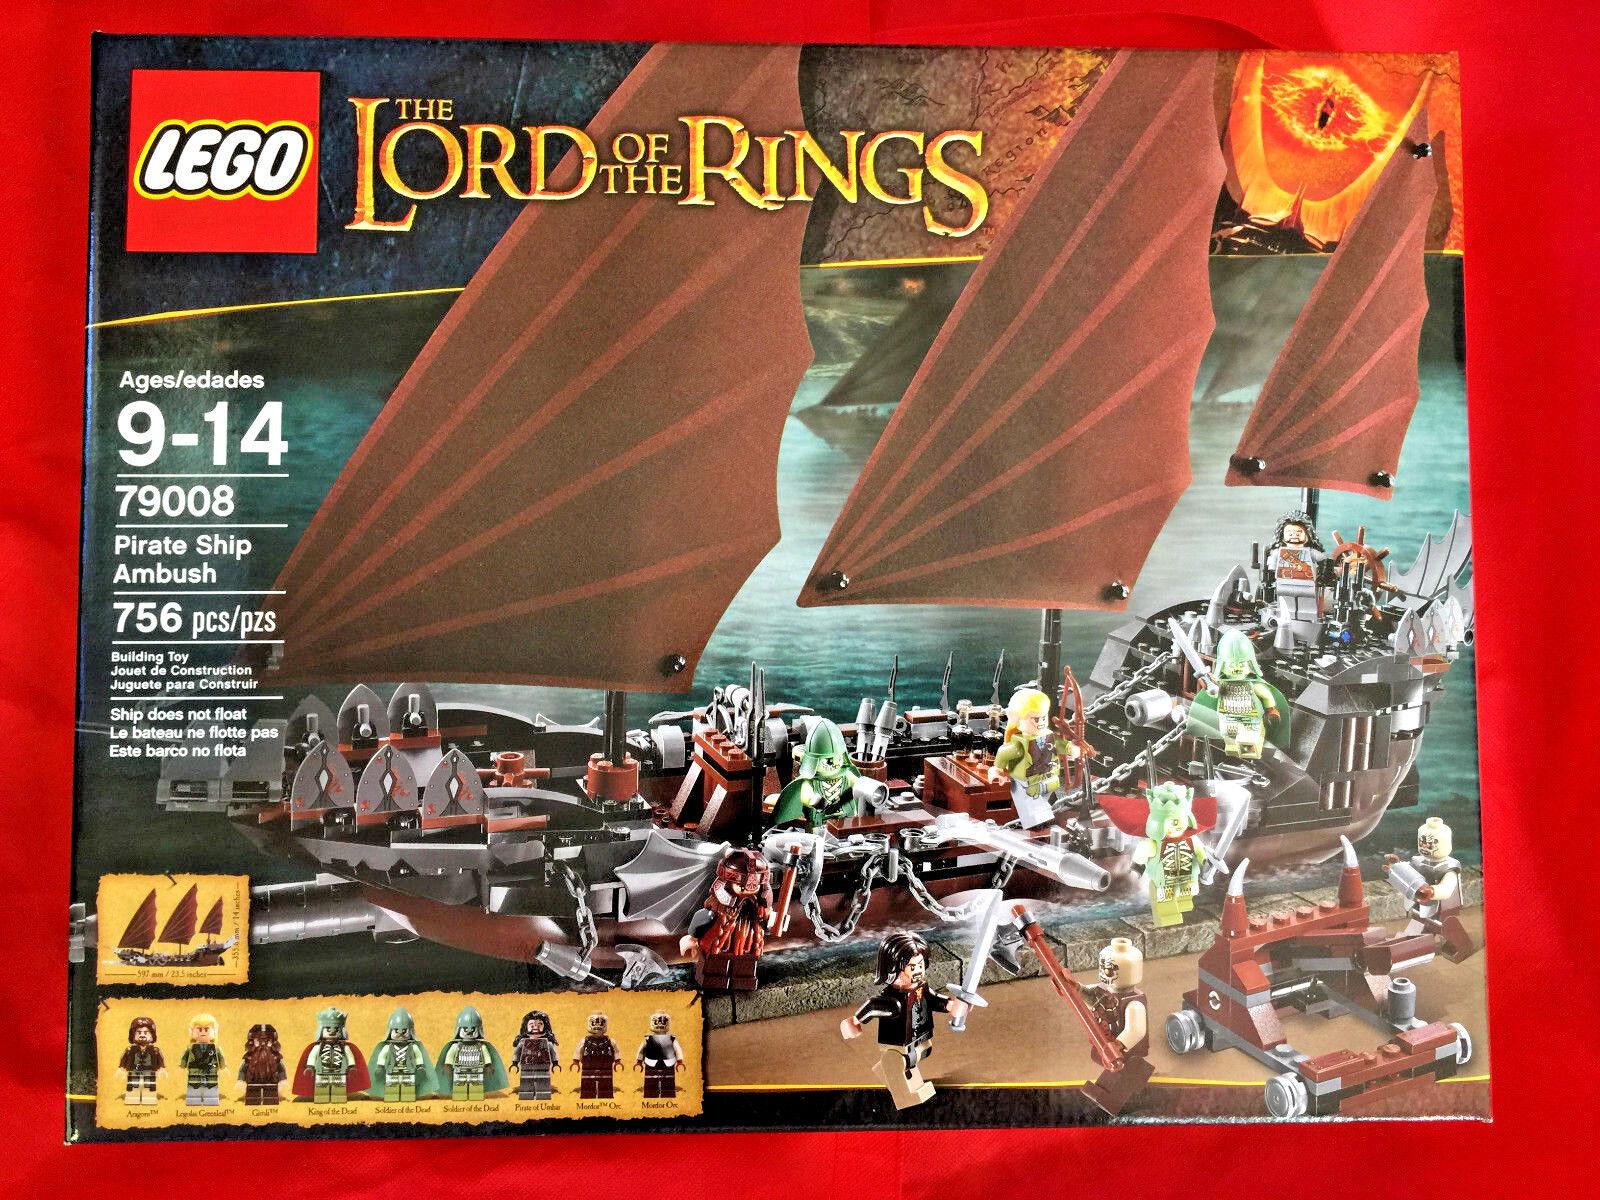 LEGO LORD of the RINGS LOTR PIRATE SHIP AMautobusH  79008 nuovo Sealed RETIrosso  economico